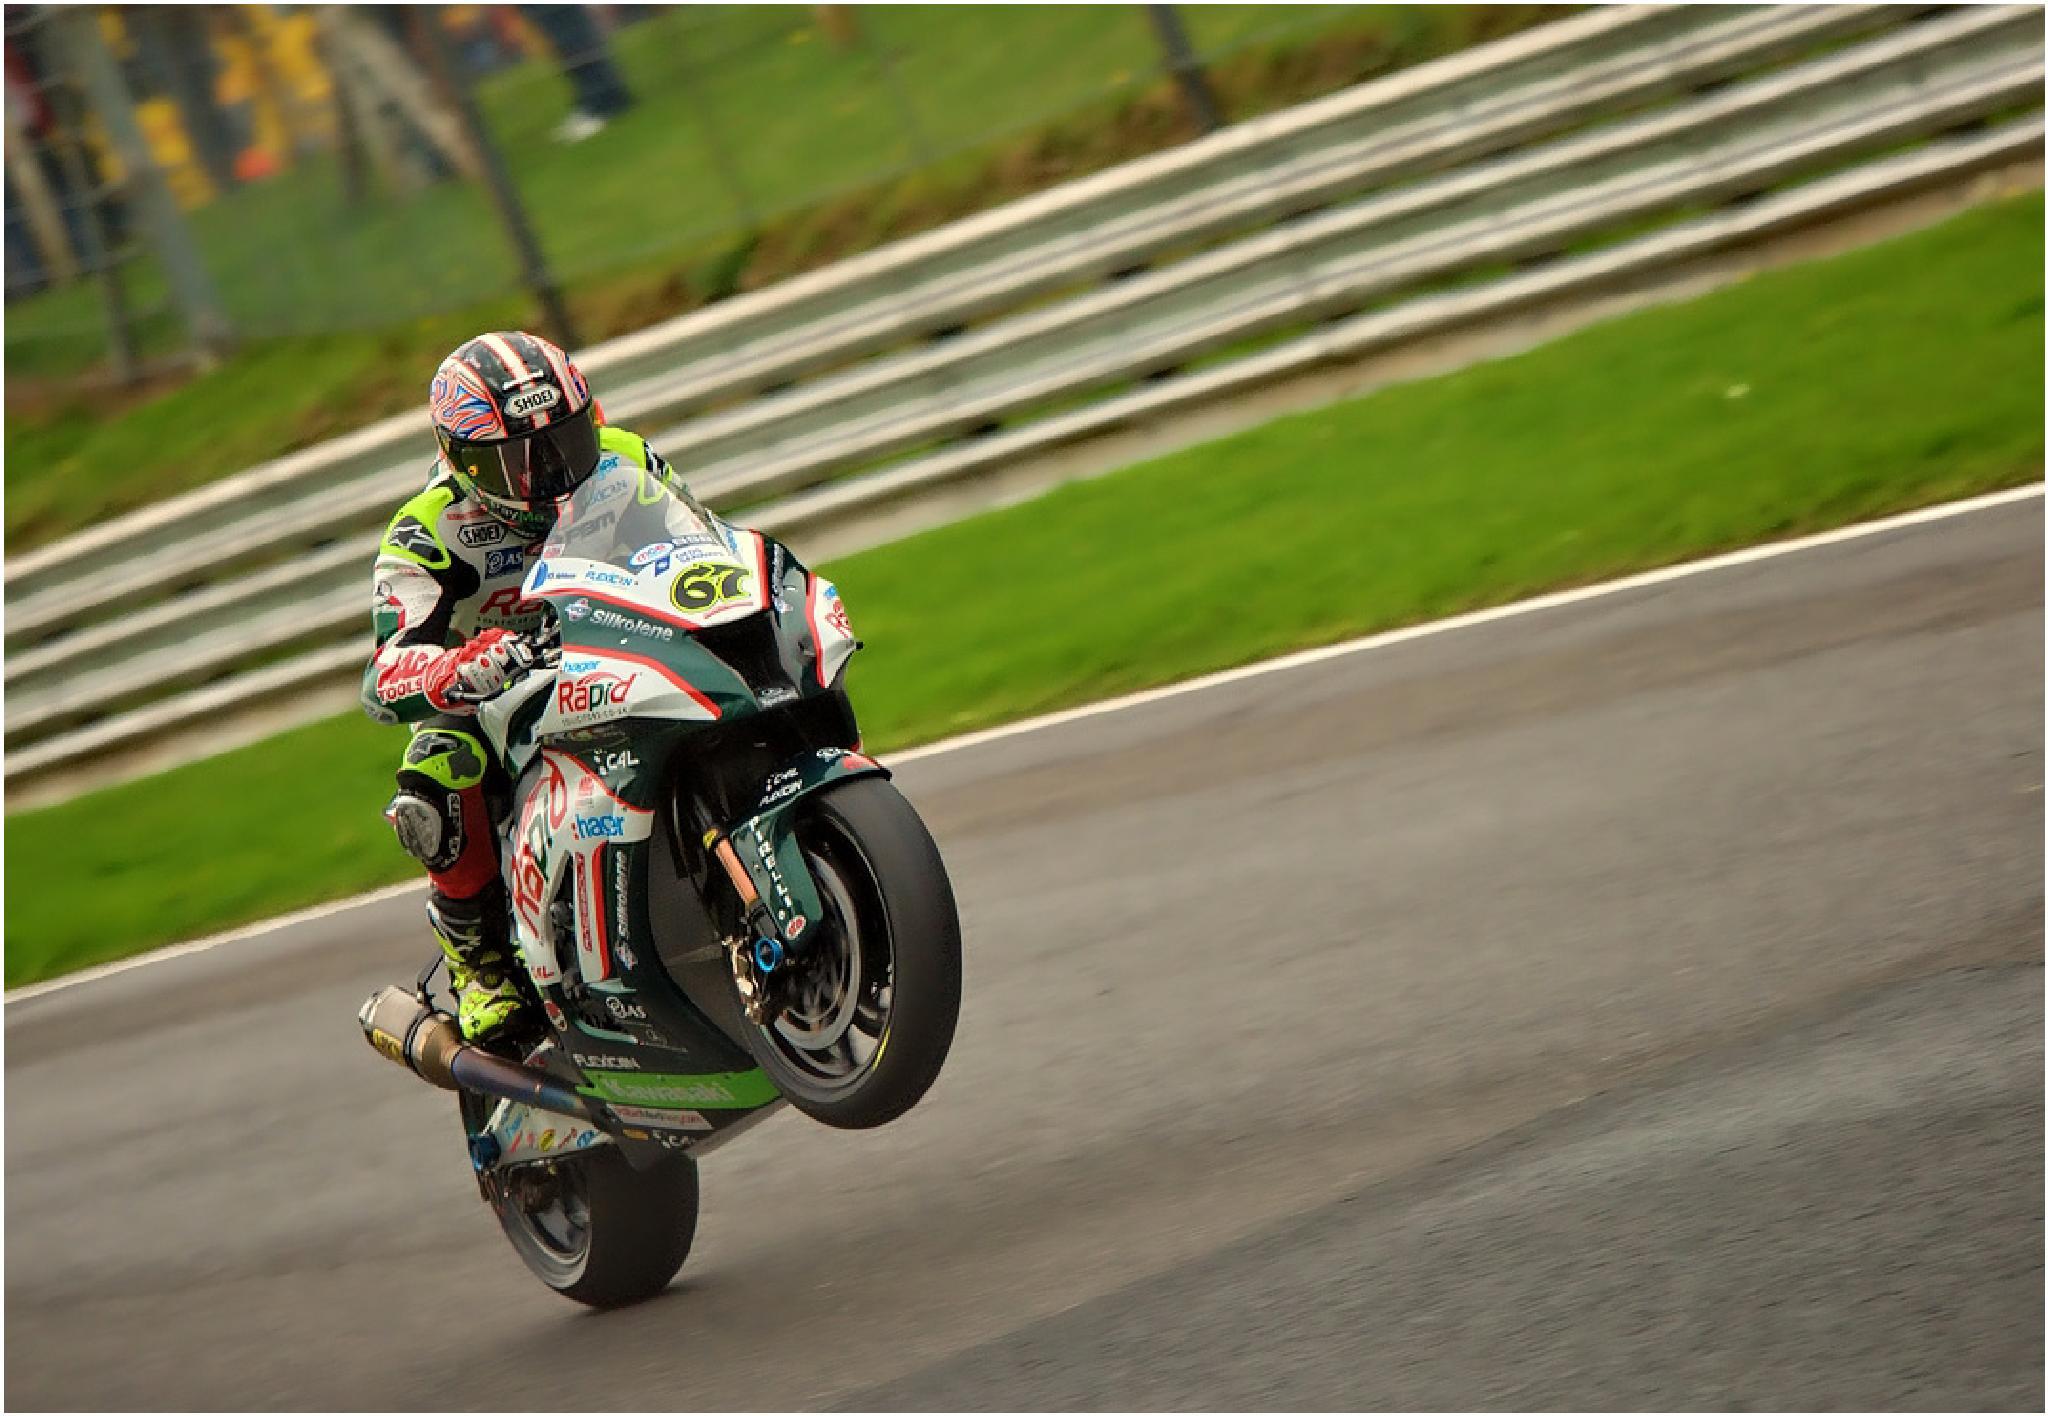 british superbike championship by sylwester.sikora